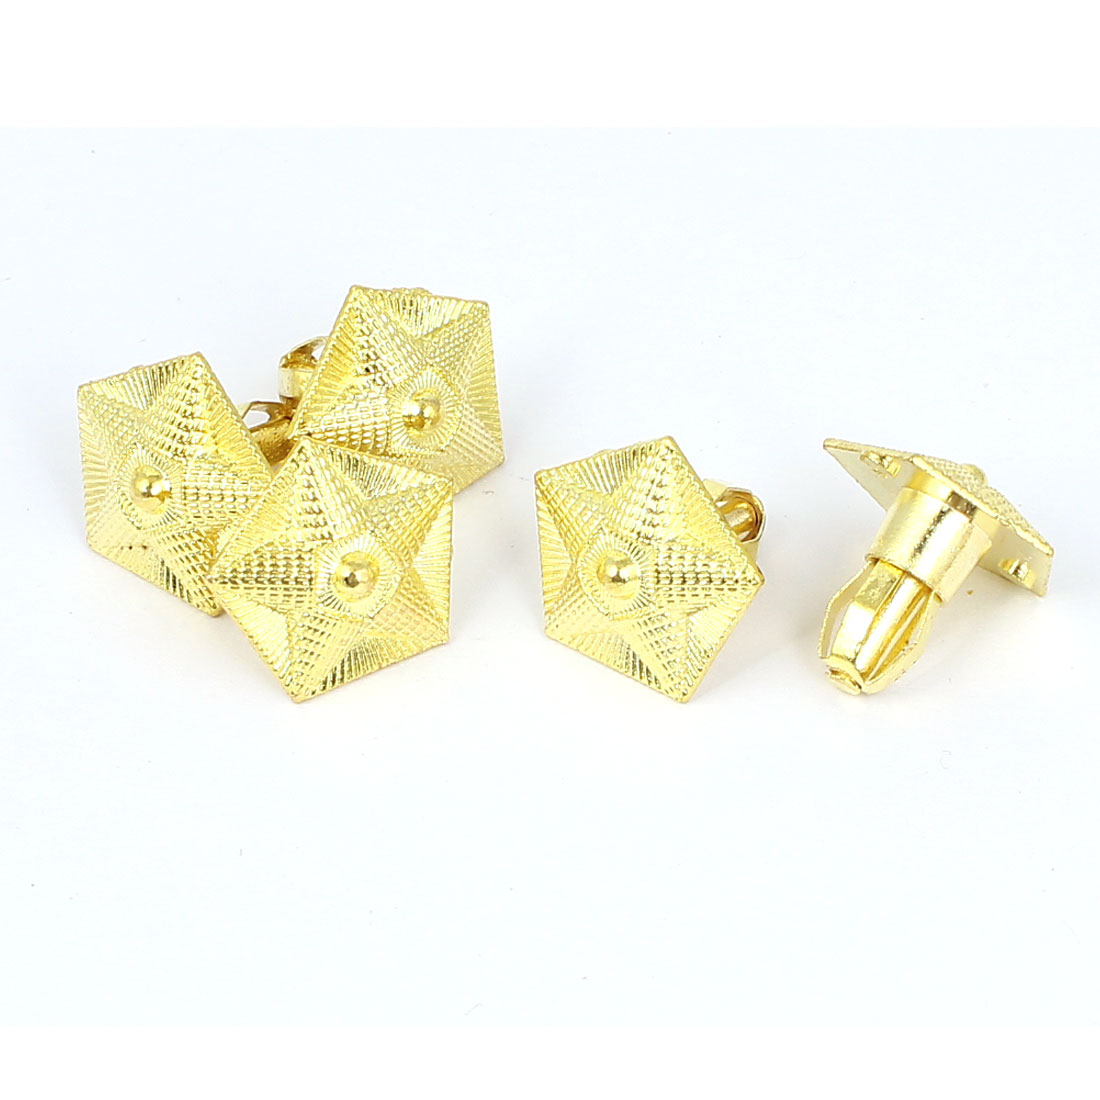 Jewelry Box Case Snap in Mount Star Shape Metal Pull Handle Grip Brass Tone 5pcs